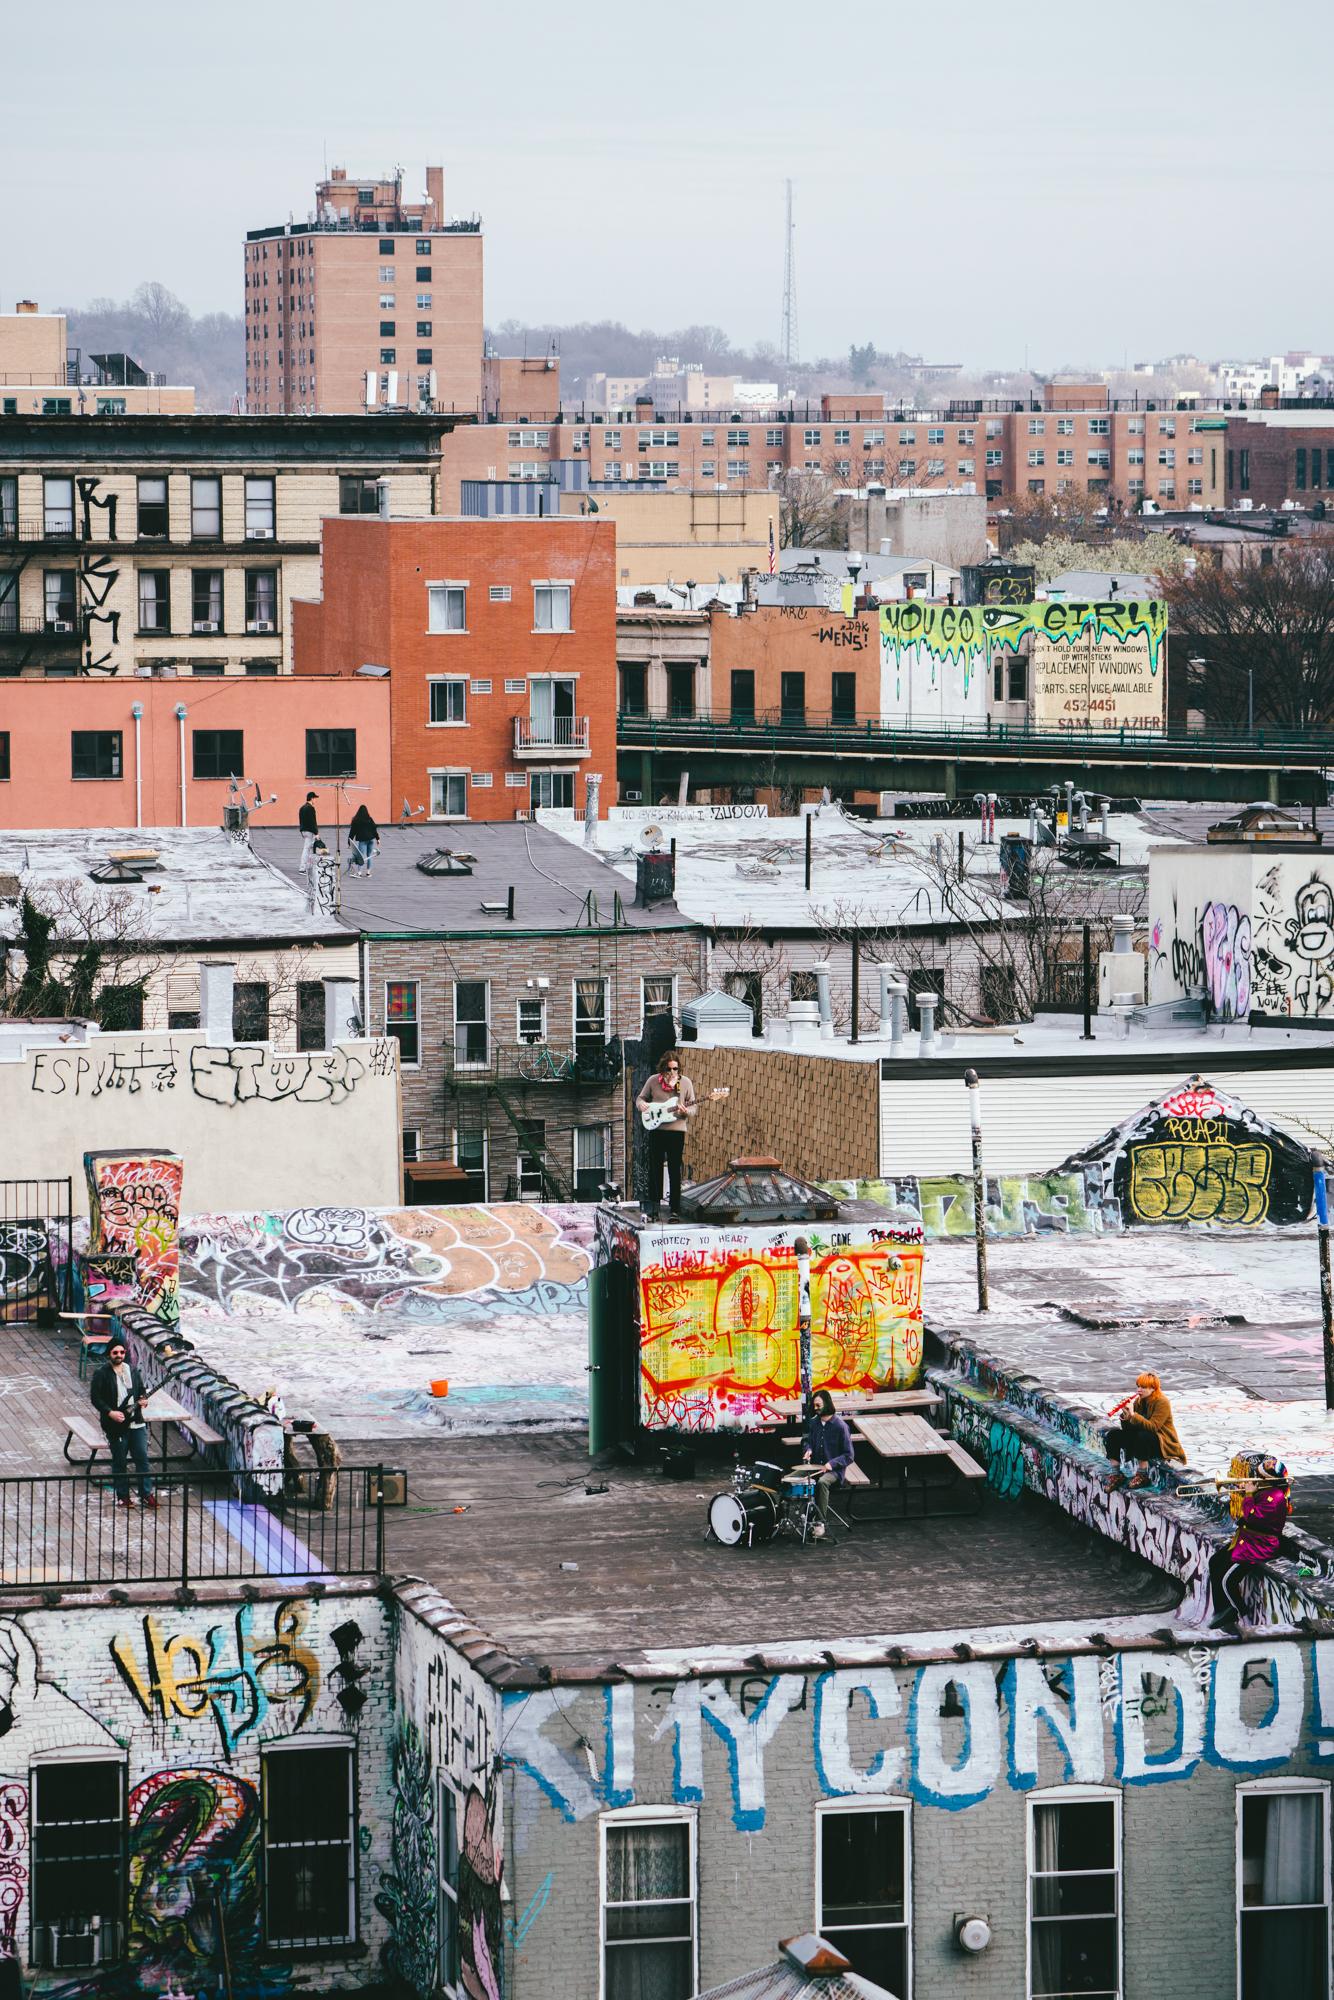 New York City roofs